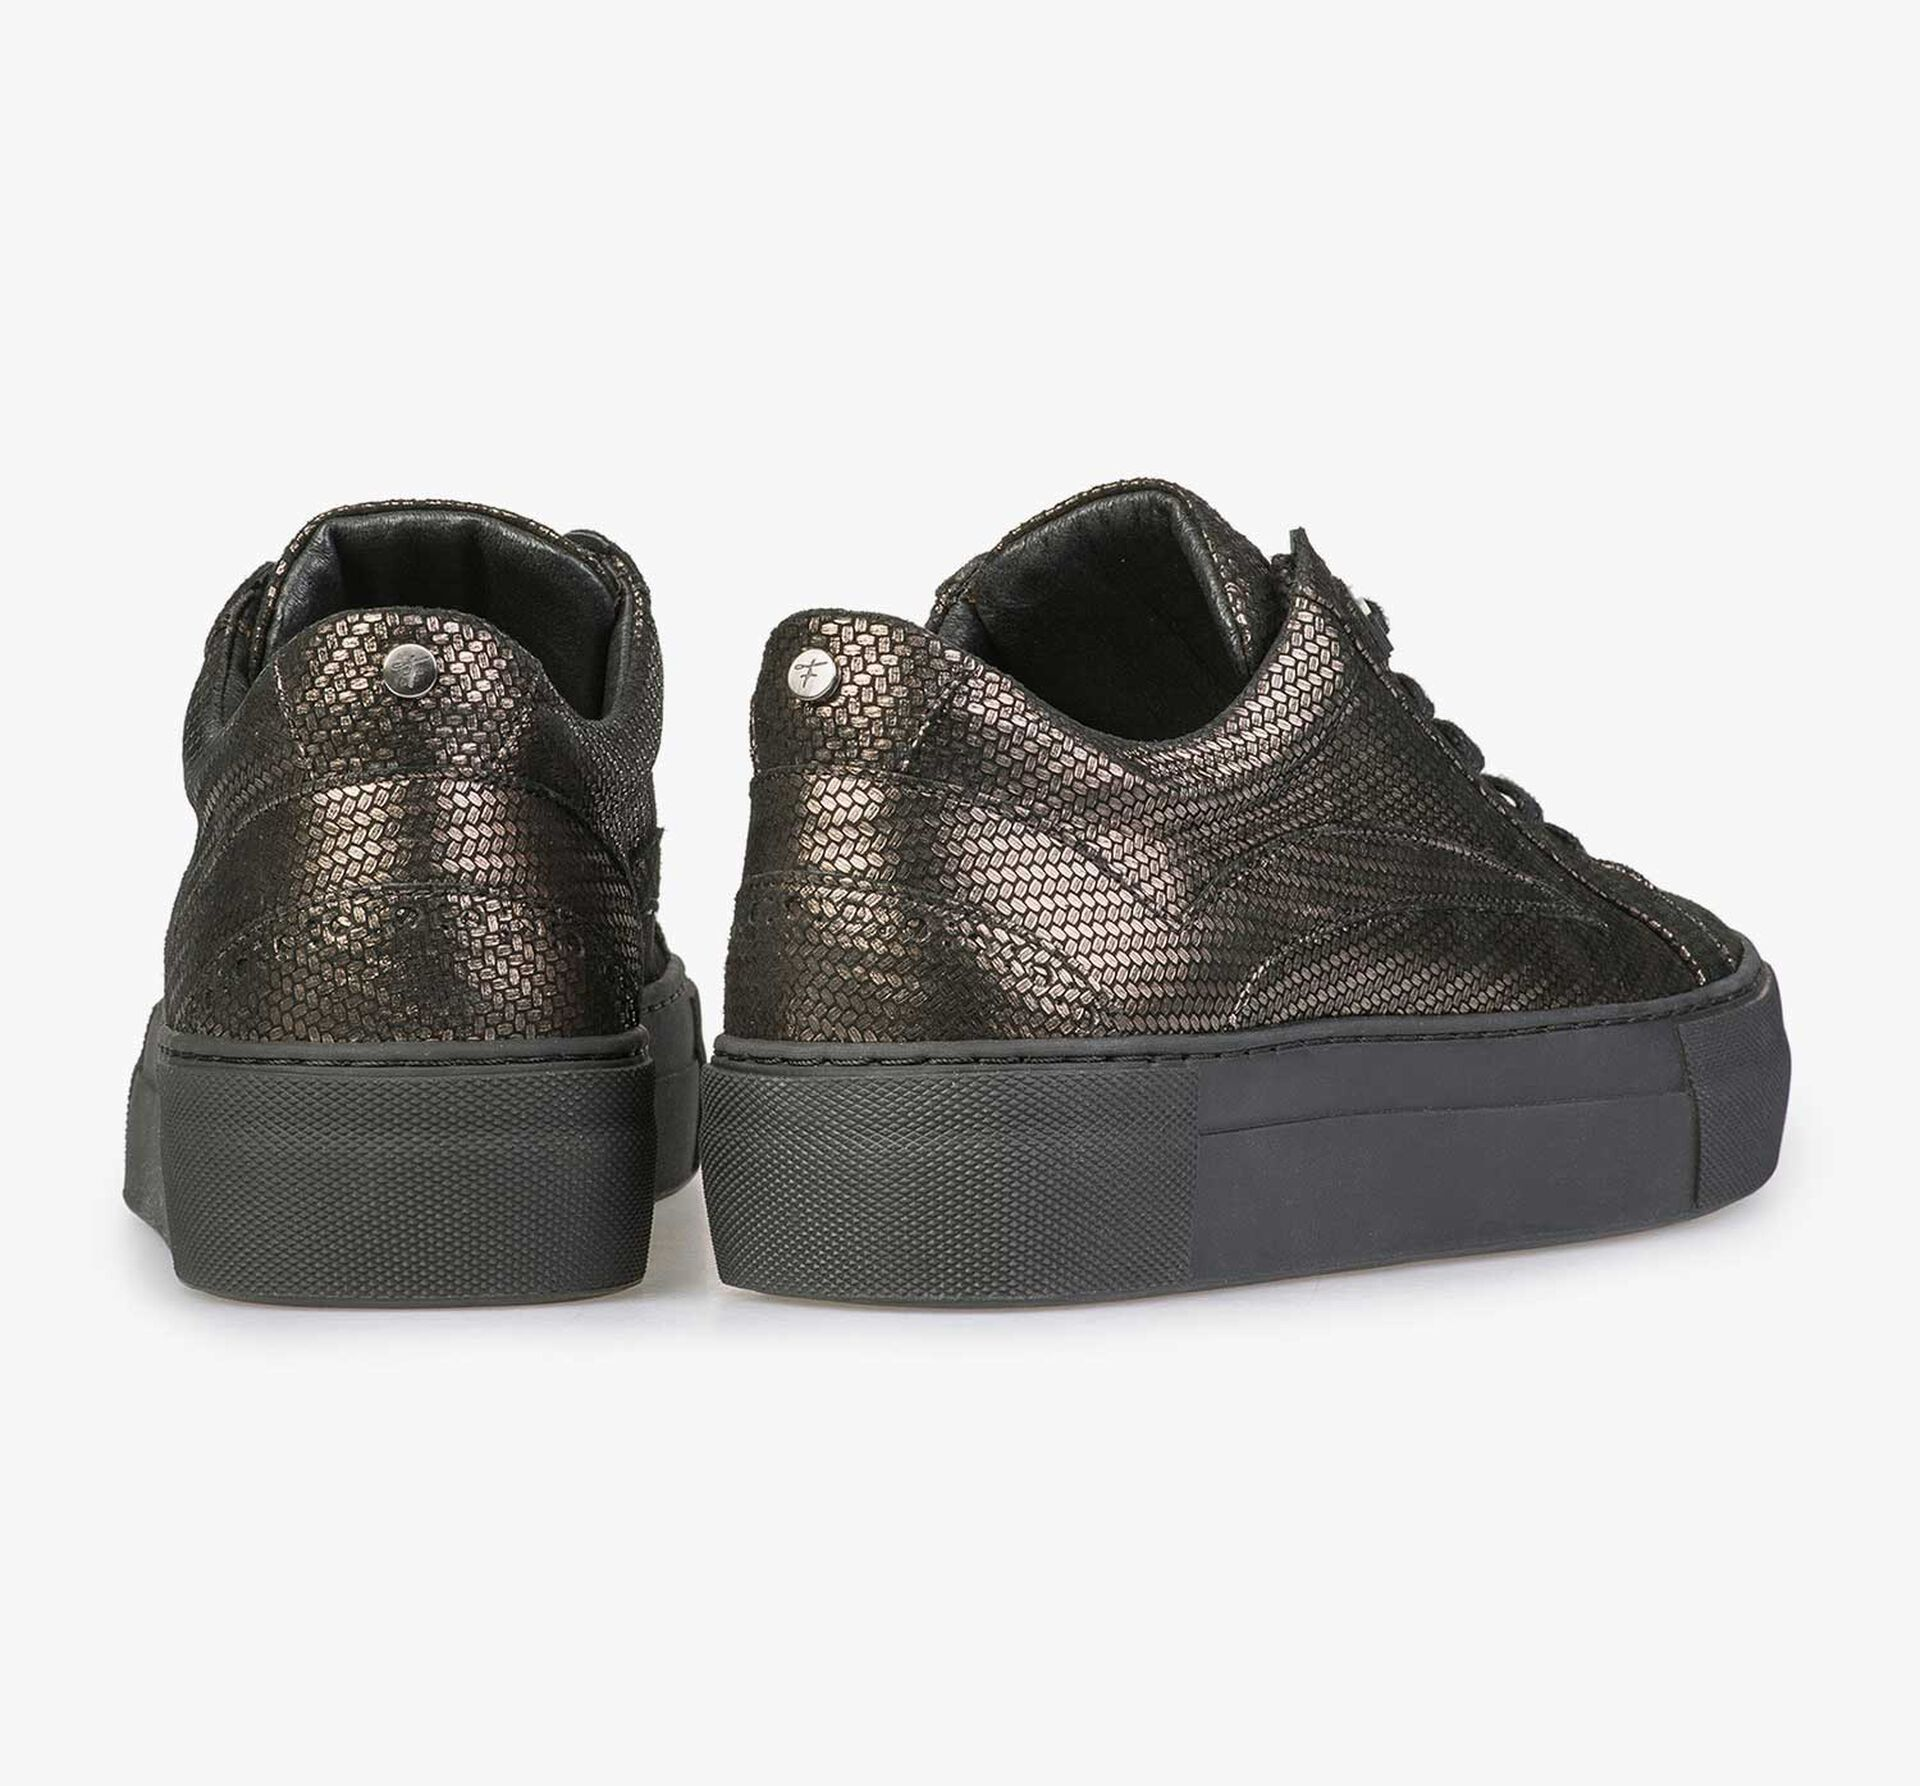 Sneaker with bronze-coloured metallic print